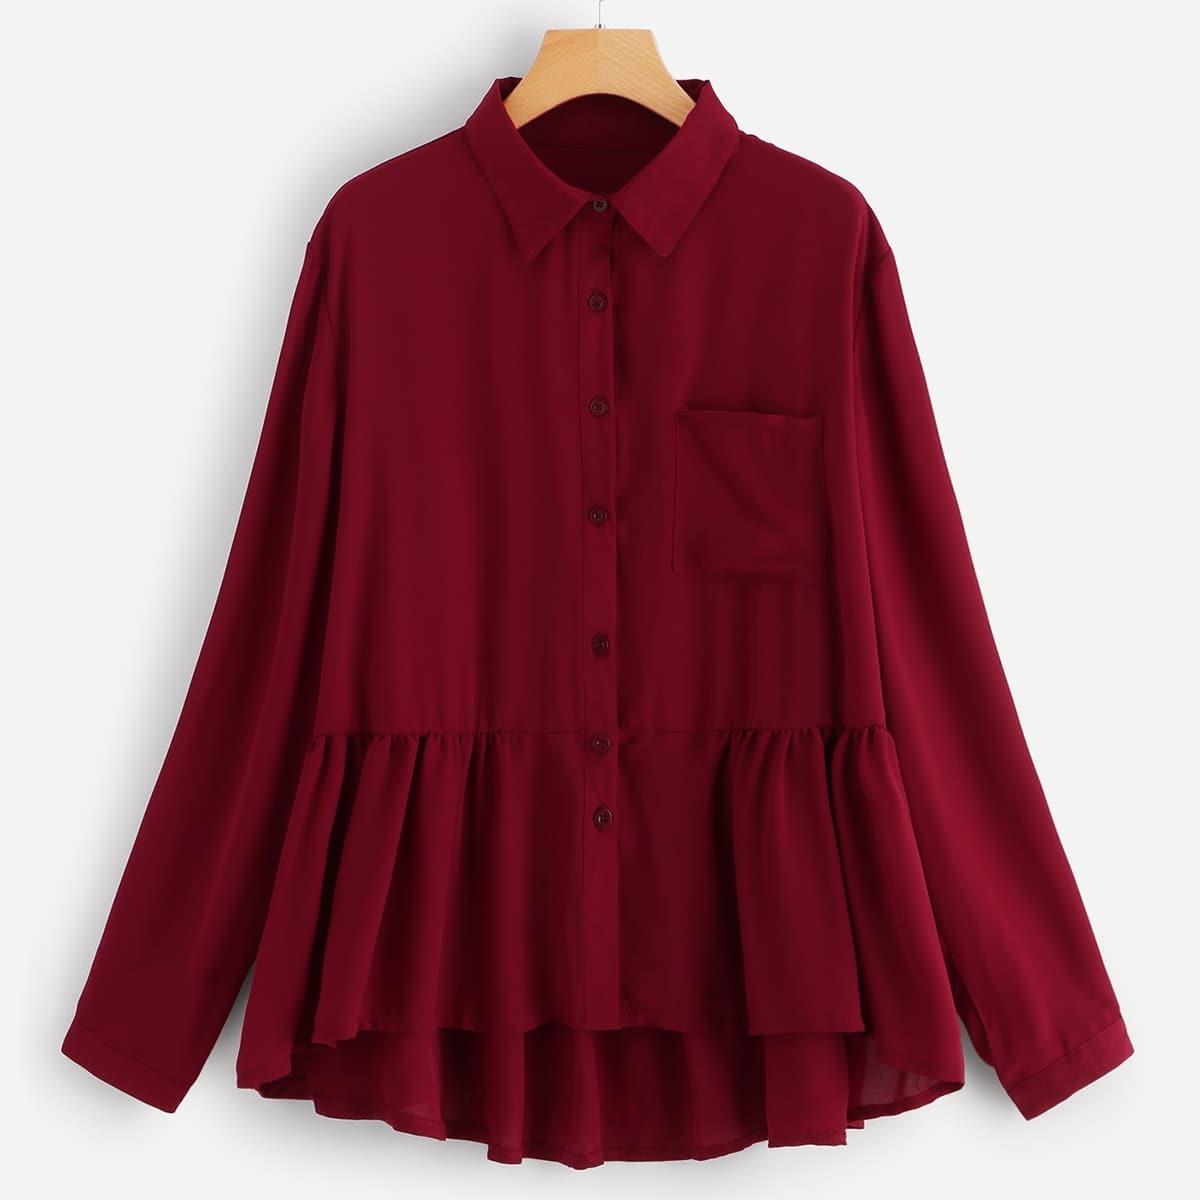 Bordeaux Casual Vlak Grote maten blouses Geribd